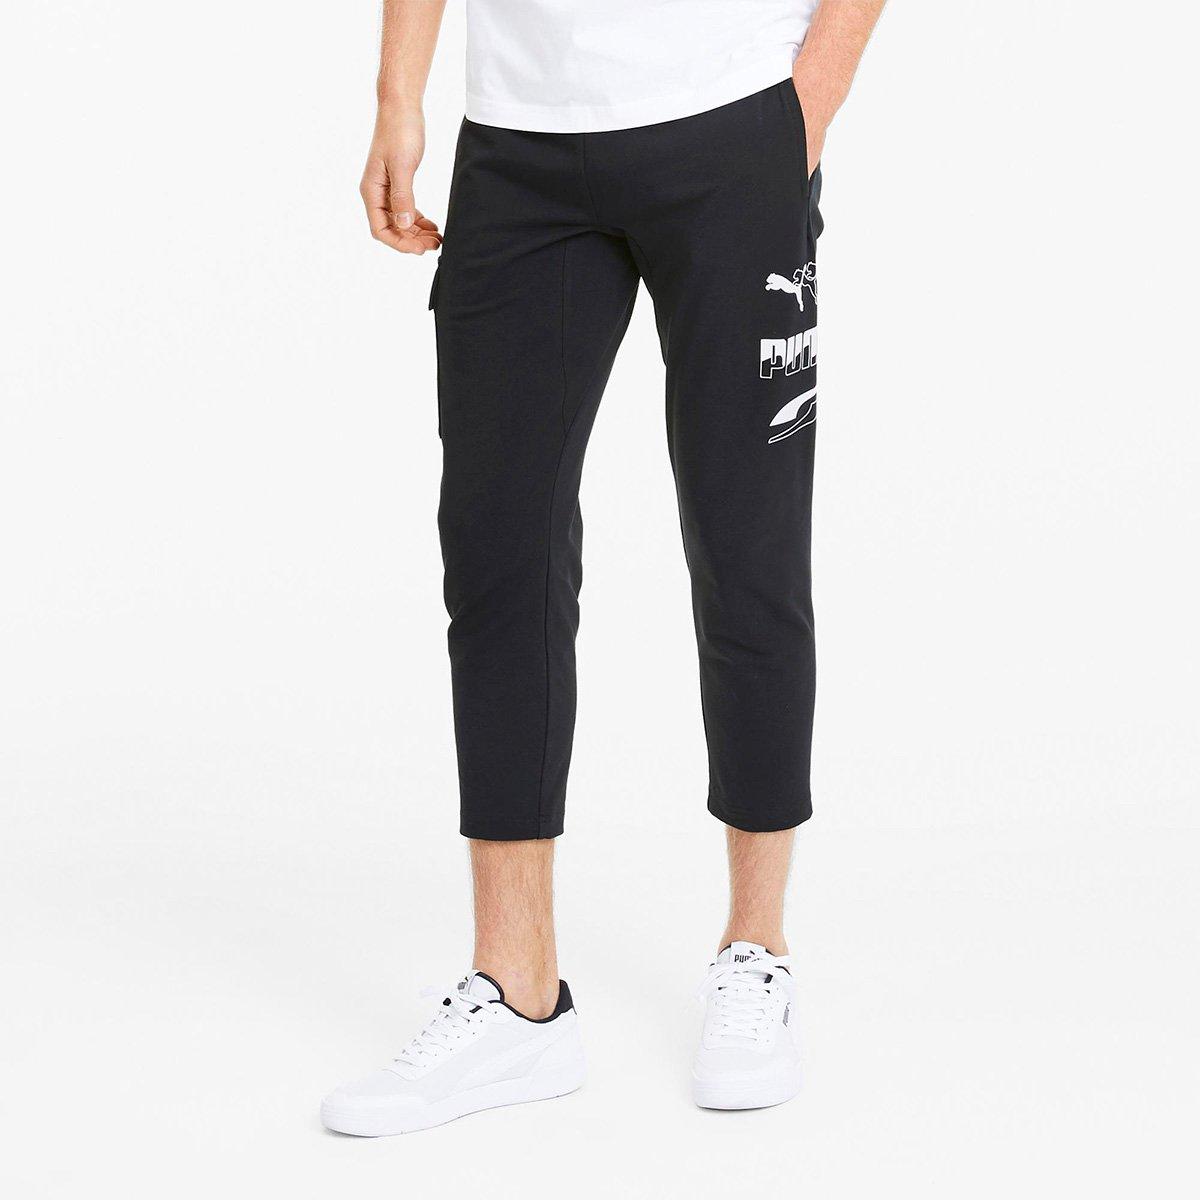 Calça Puma Rebel Pants Masculina